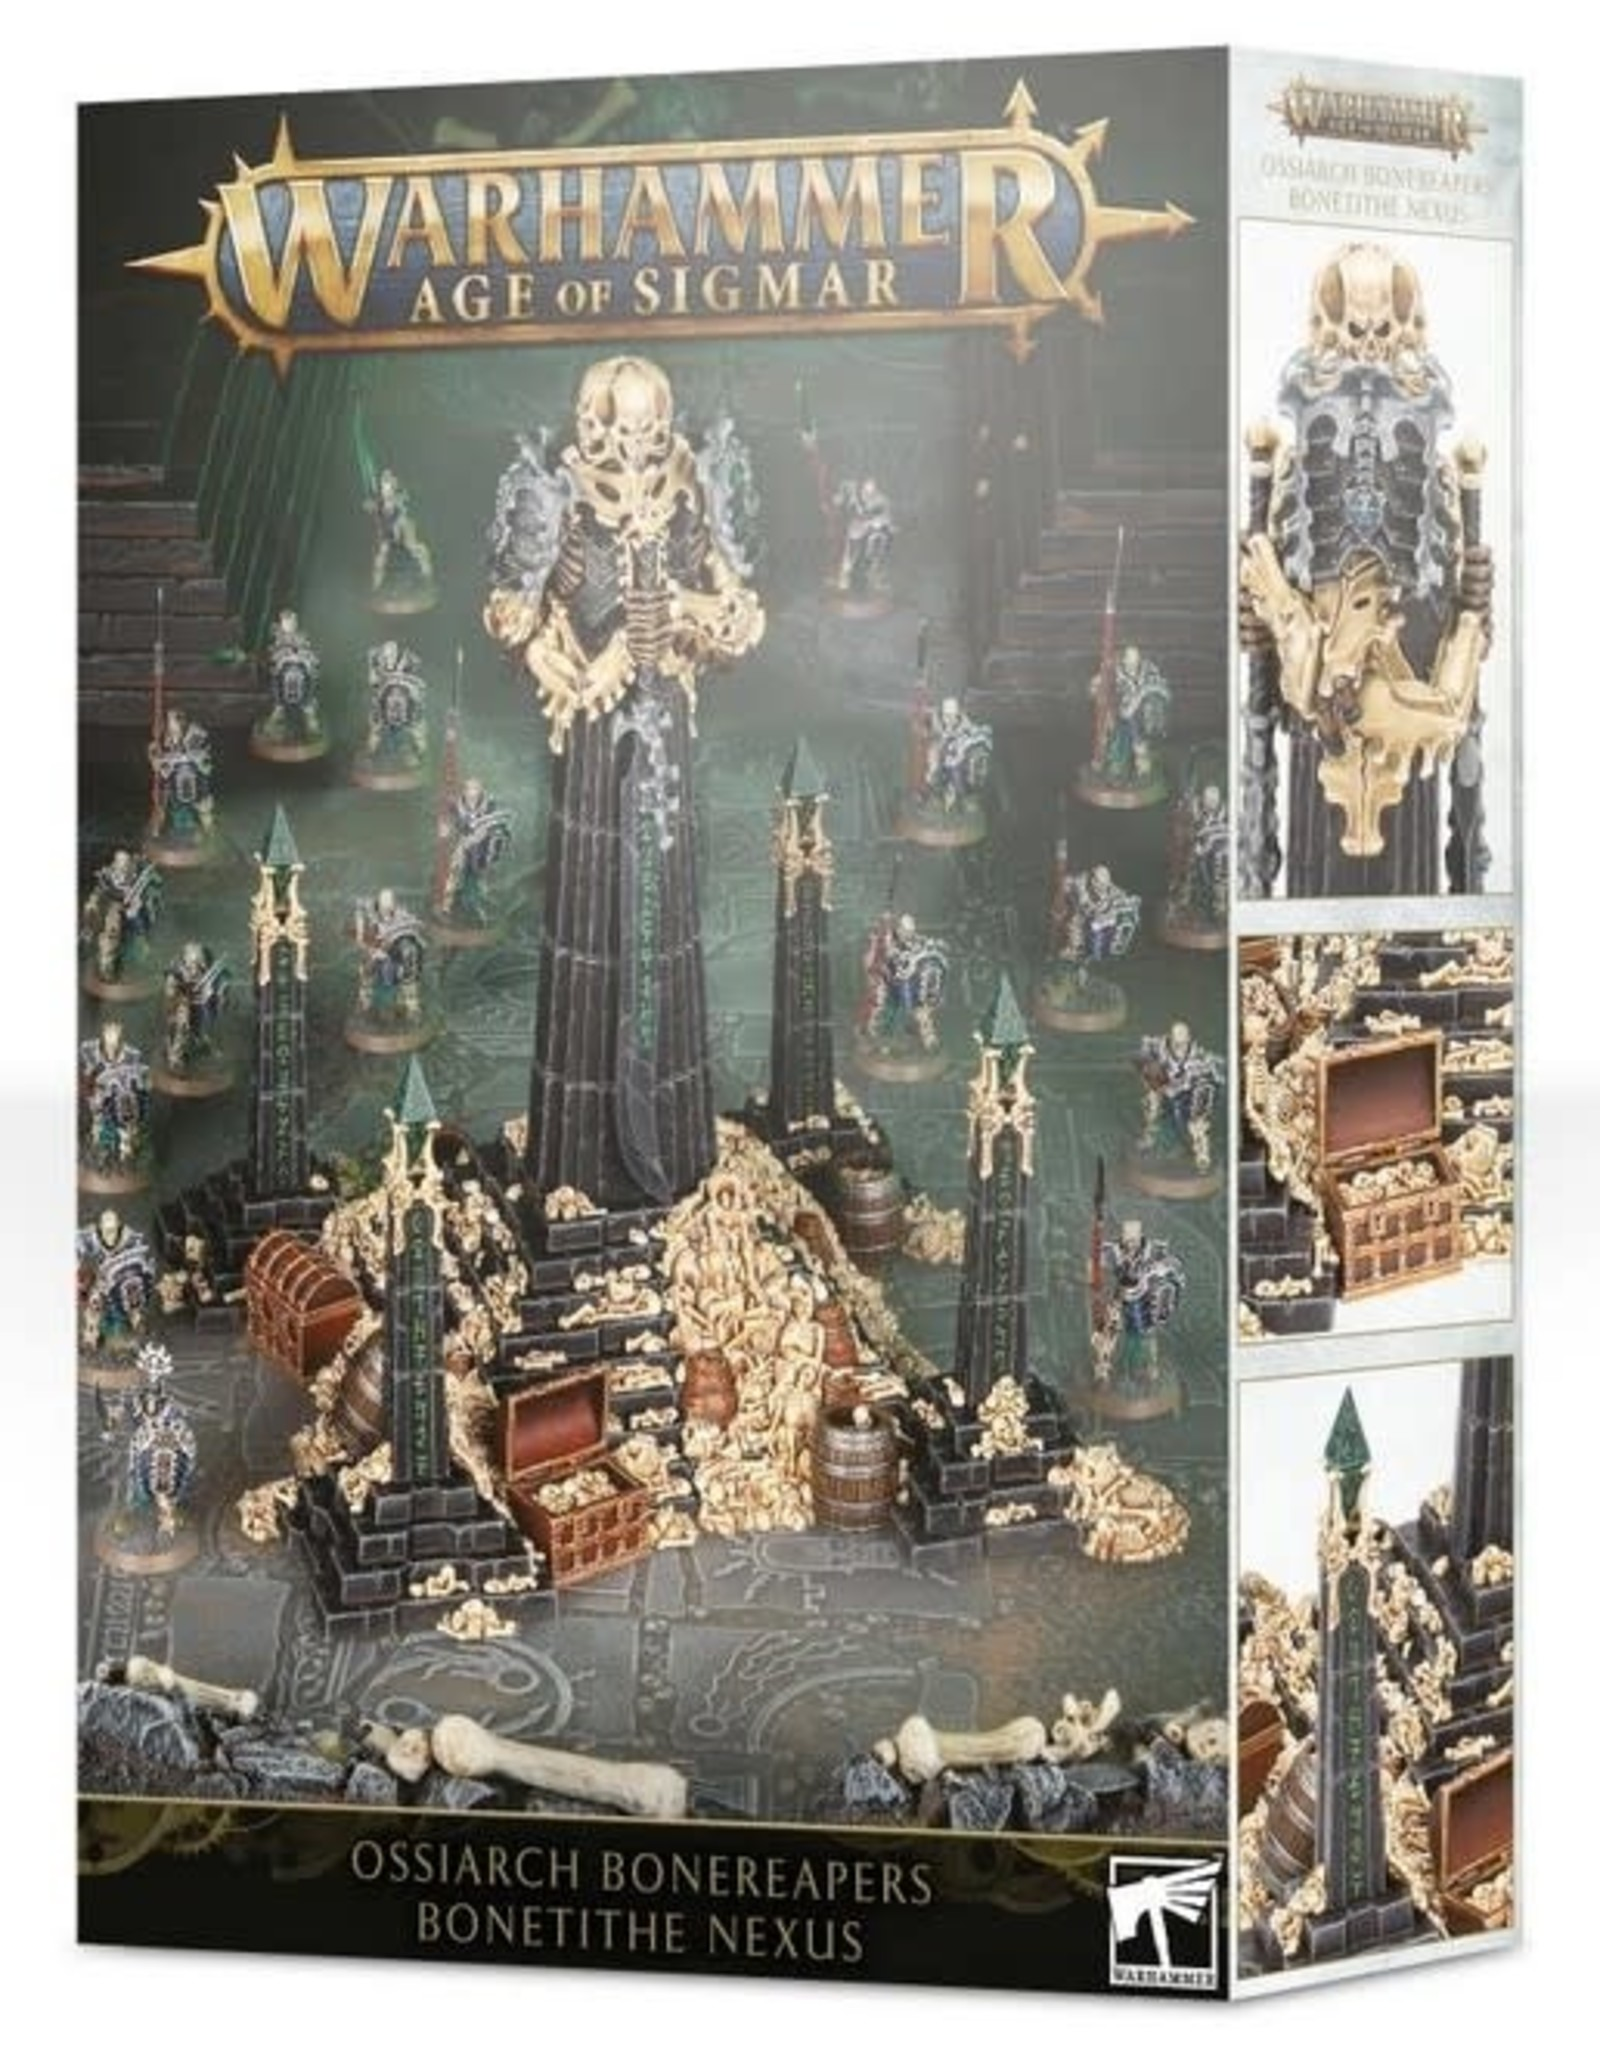 Warhammer AoS WHAoS Ossiarch Bonereapers Bone-tithe Nexus